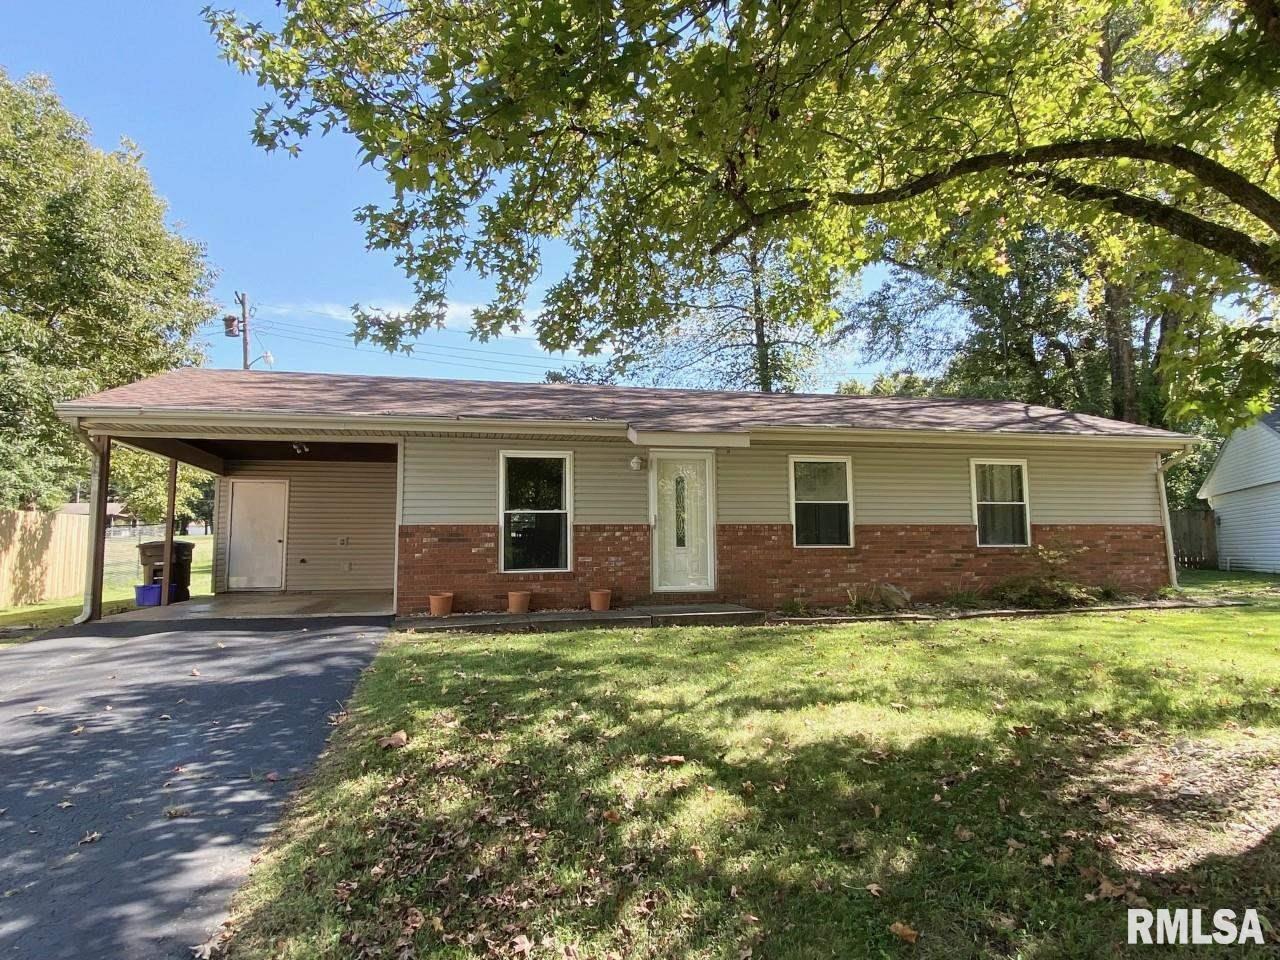 1025 W WILLOW Street Property Image